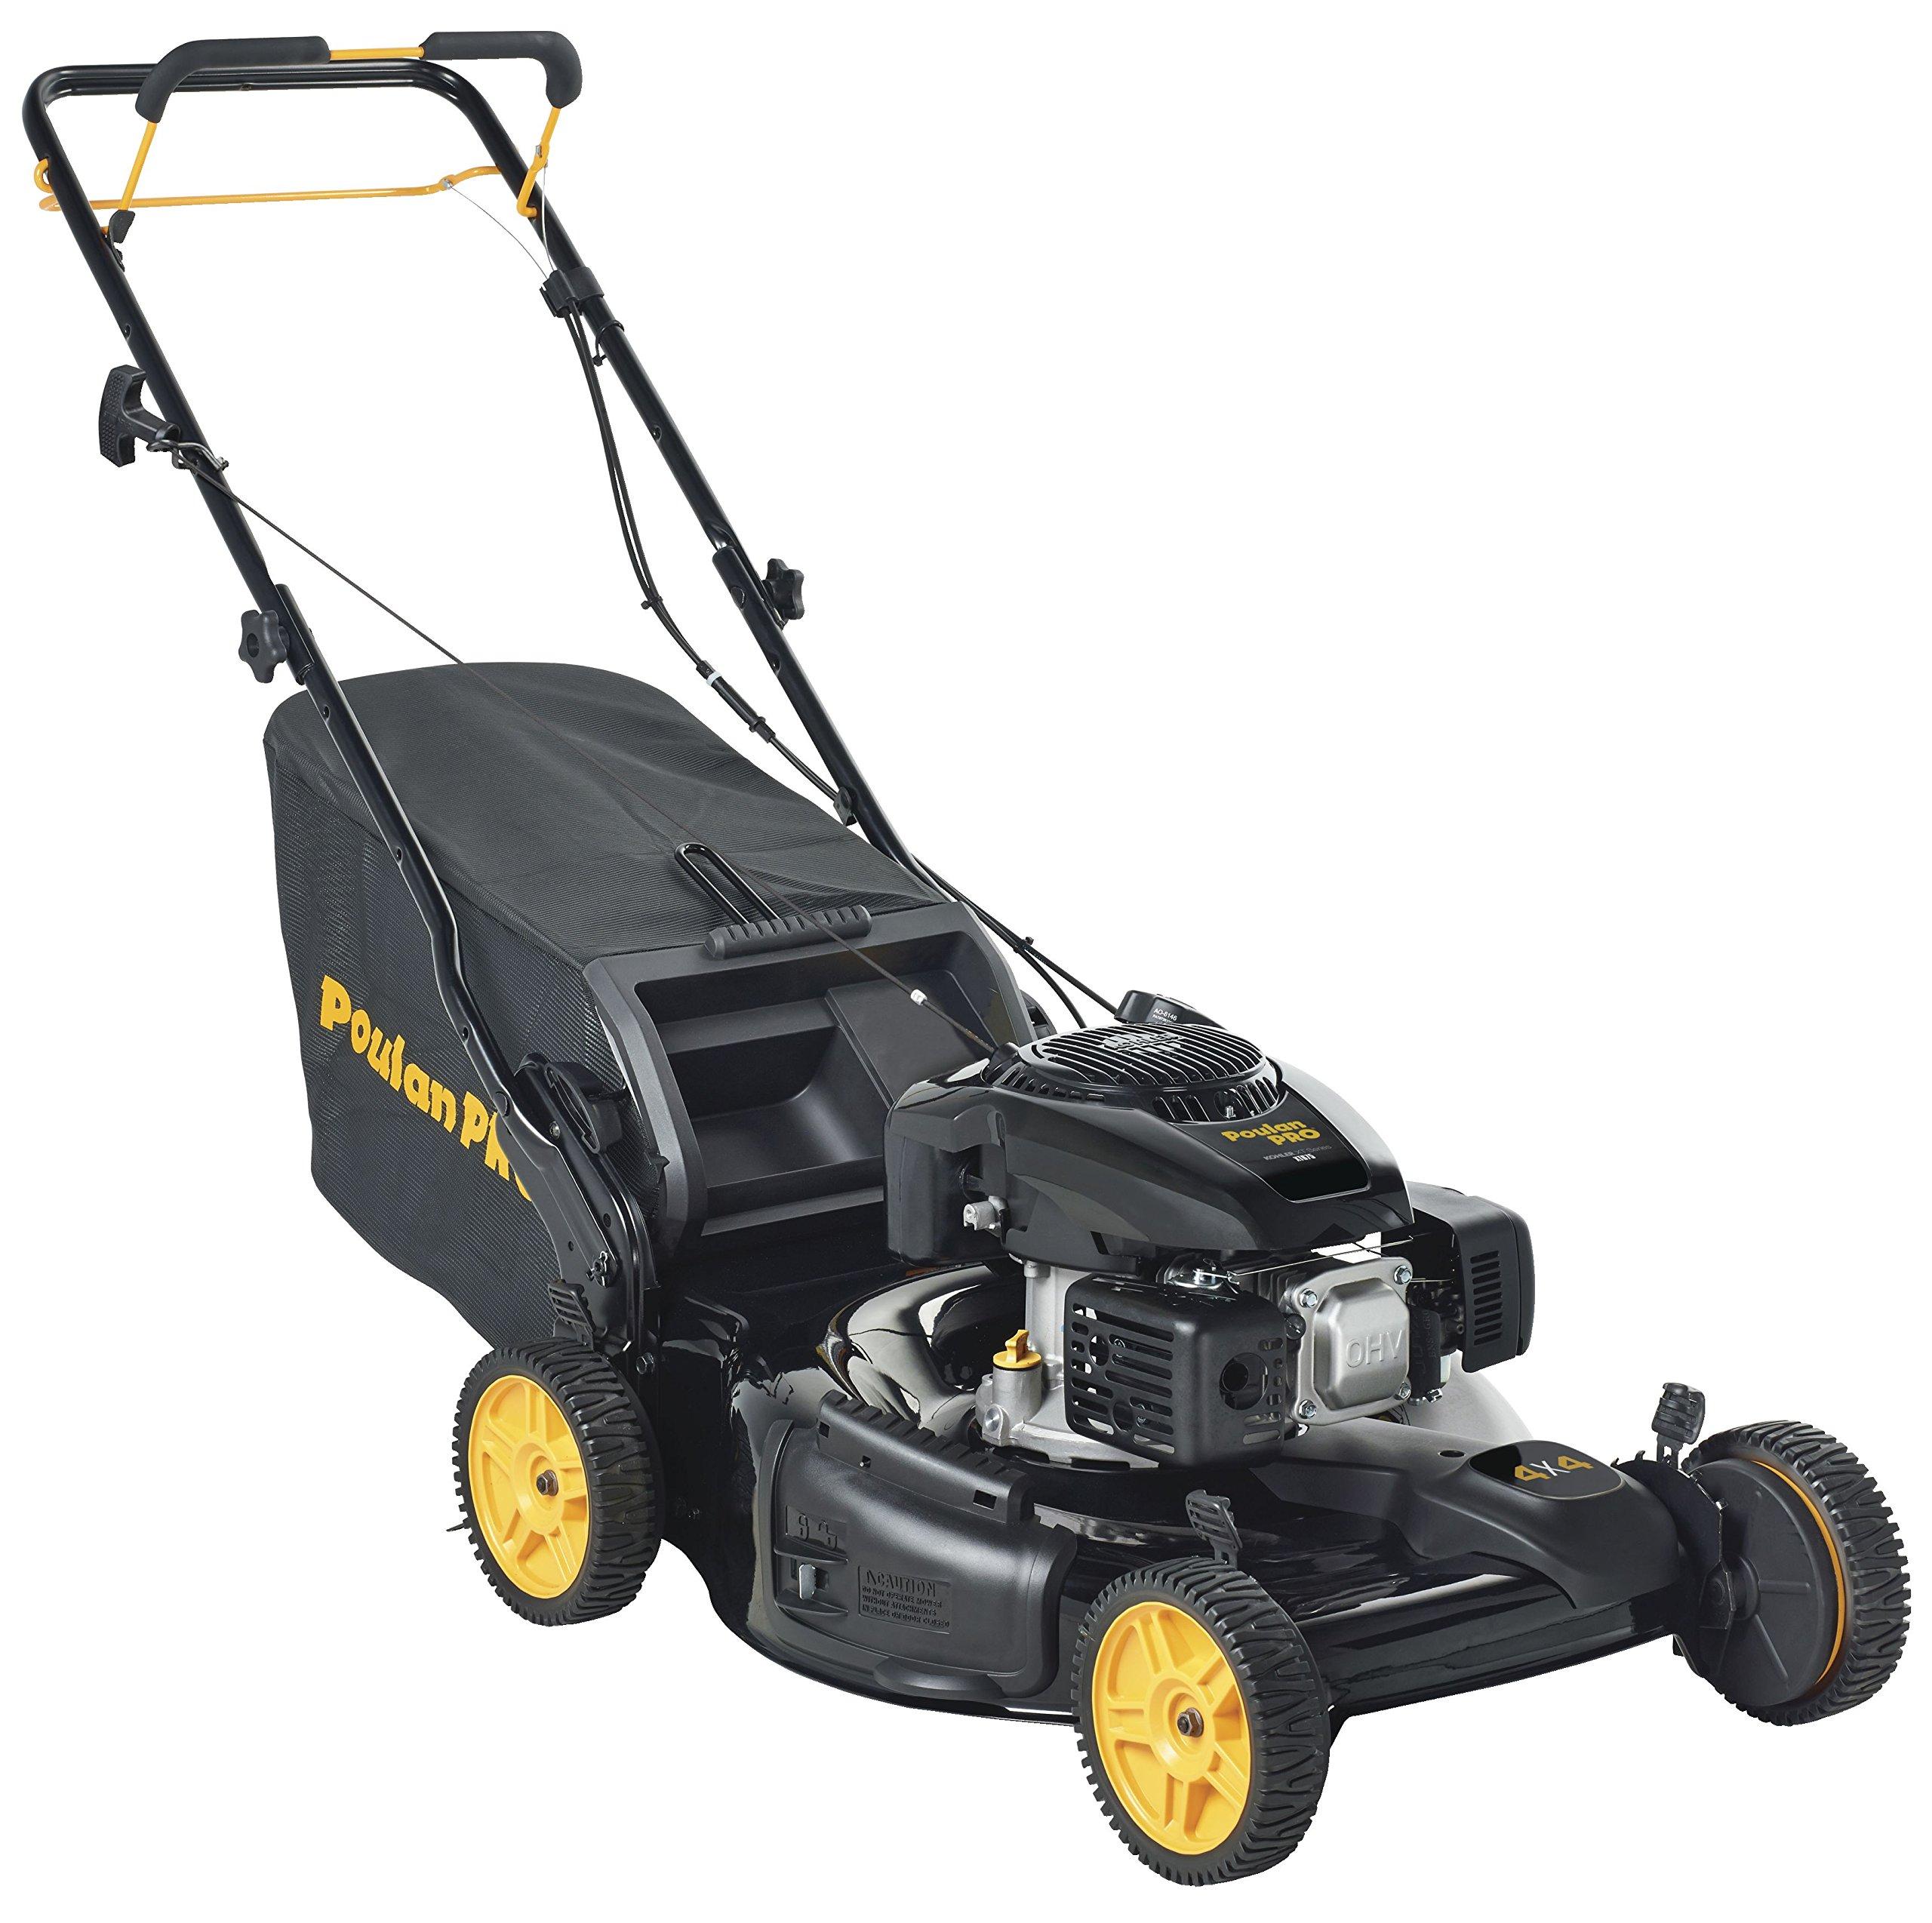 Poulan Pro 961420128 PR675AWD Kohler 675 Side Discharge/Mulch/Bag 3-in-1 All Wheel Drive Mower in 22-Inch Deck